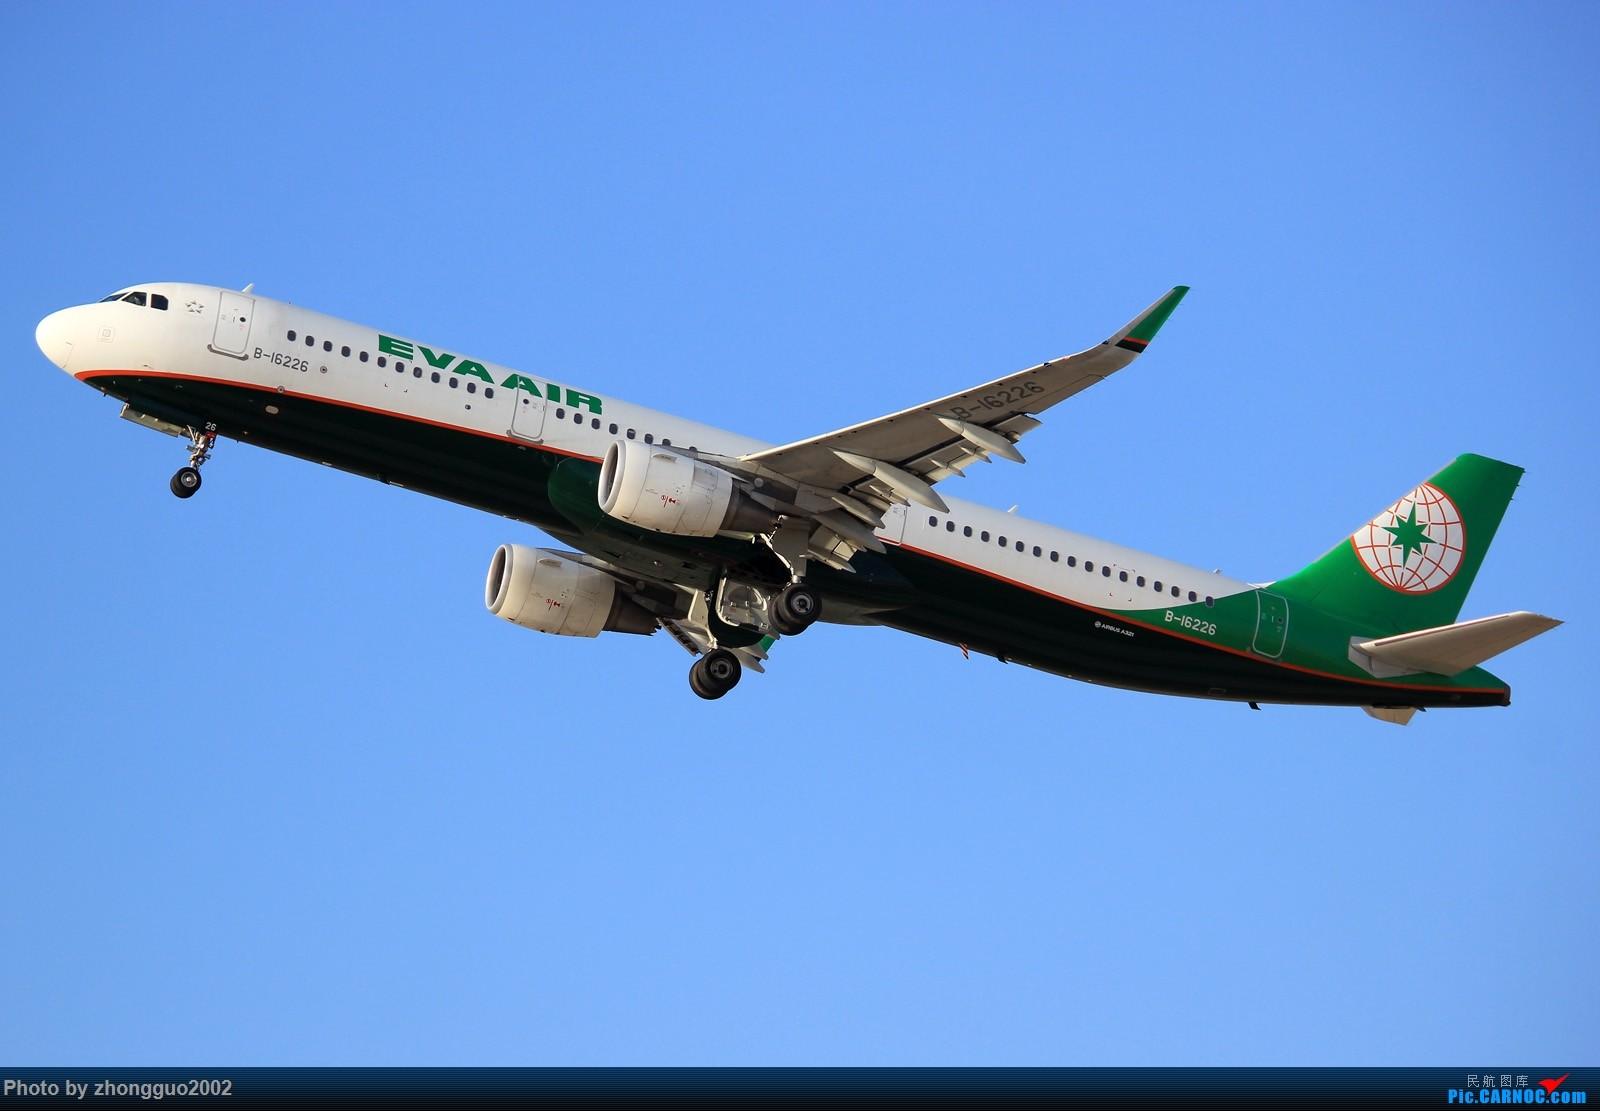 Re:[原创]久违---呼和浩特 AIRBUS A321-200 B-16226 中国呼和浩特白塔国际机场